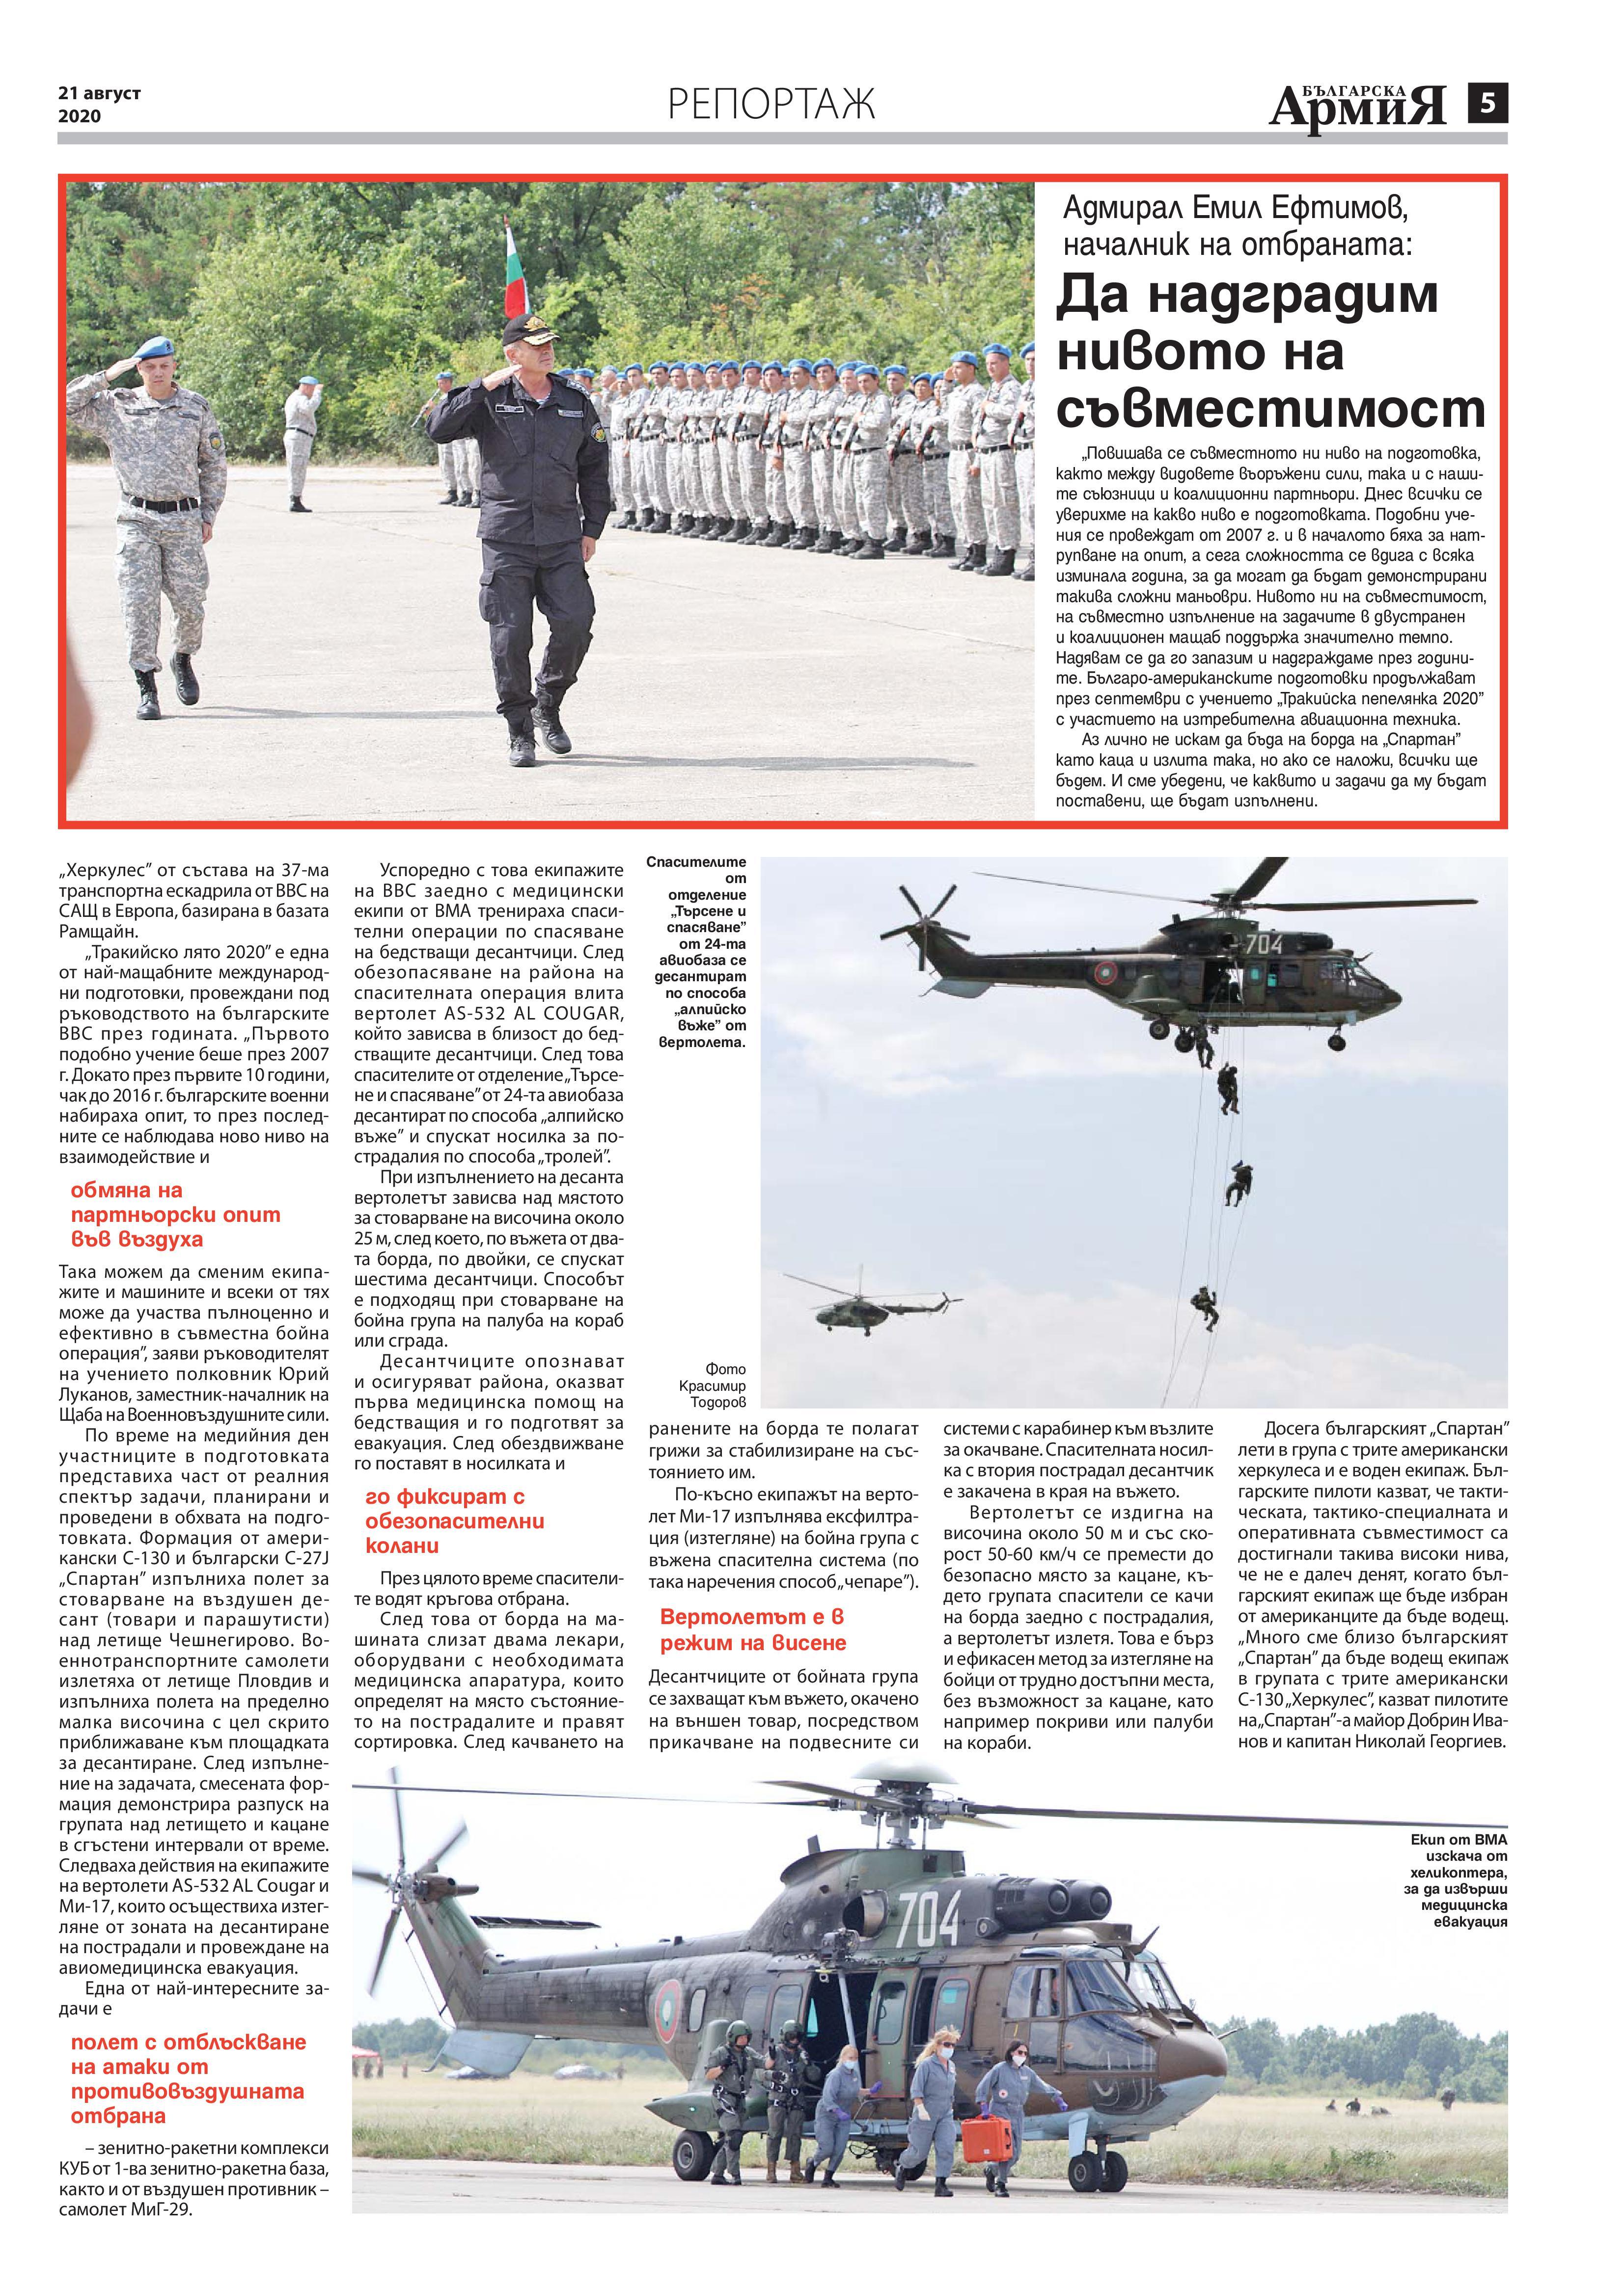 https://armymedia.bg/wp-content/uploads/2015/06/05-37.jpg